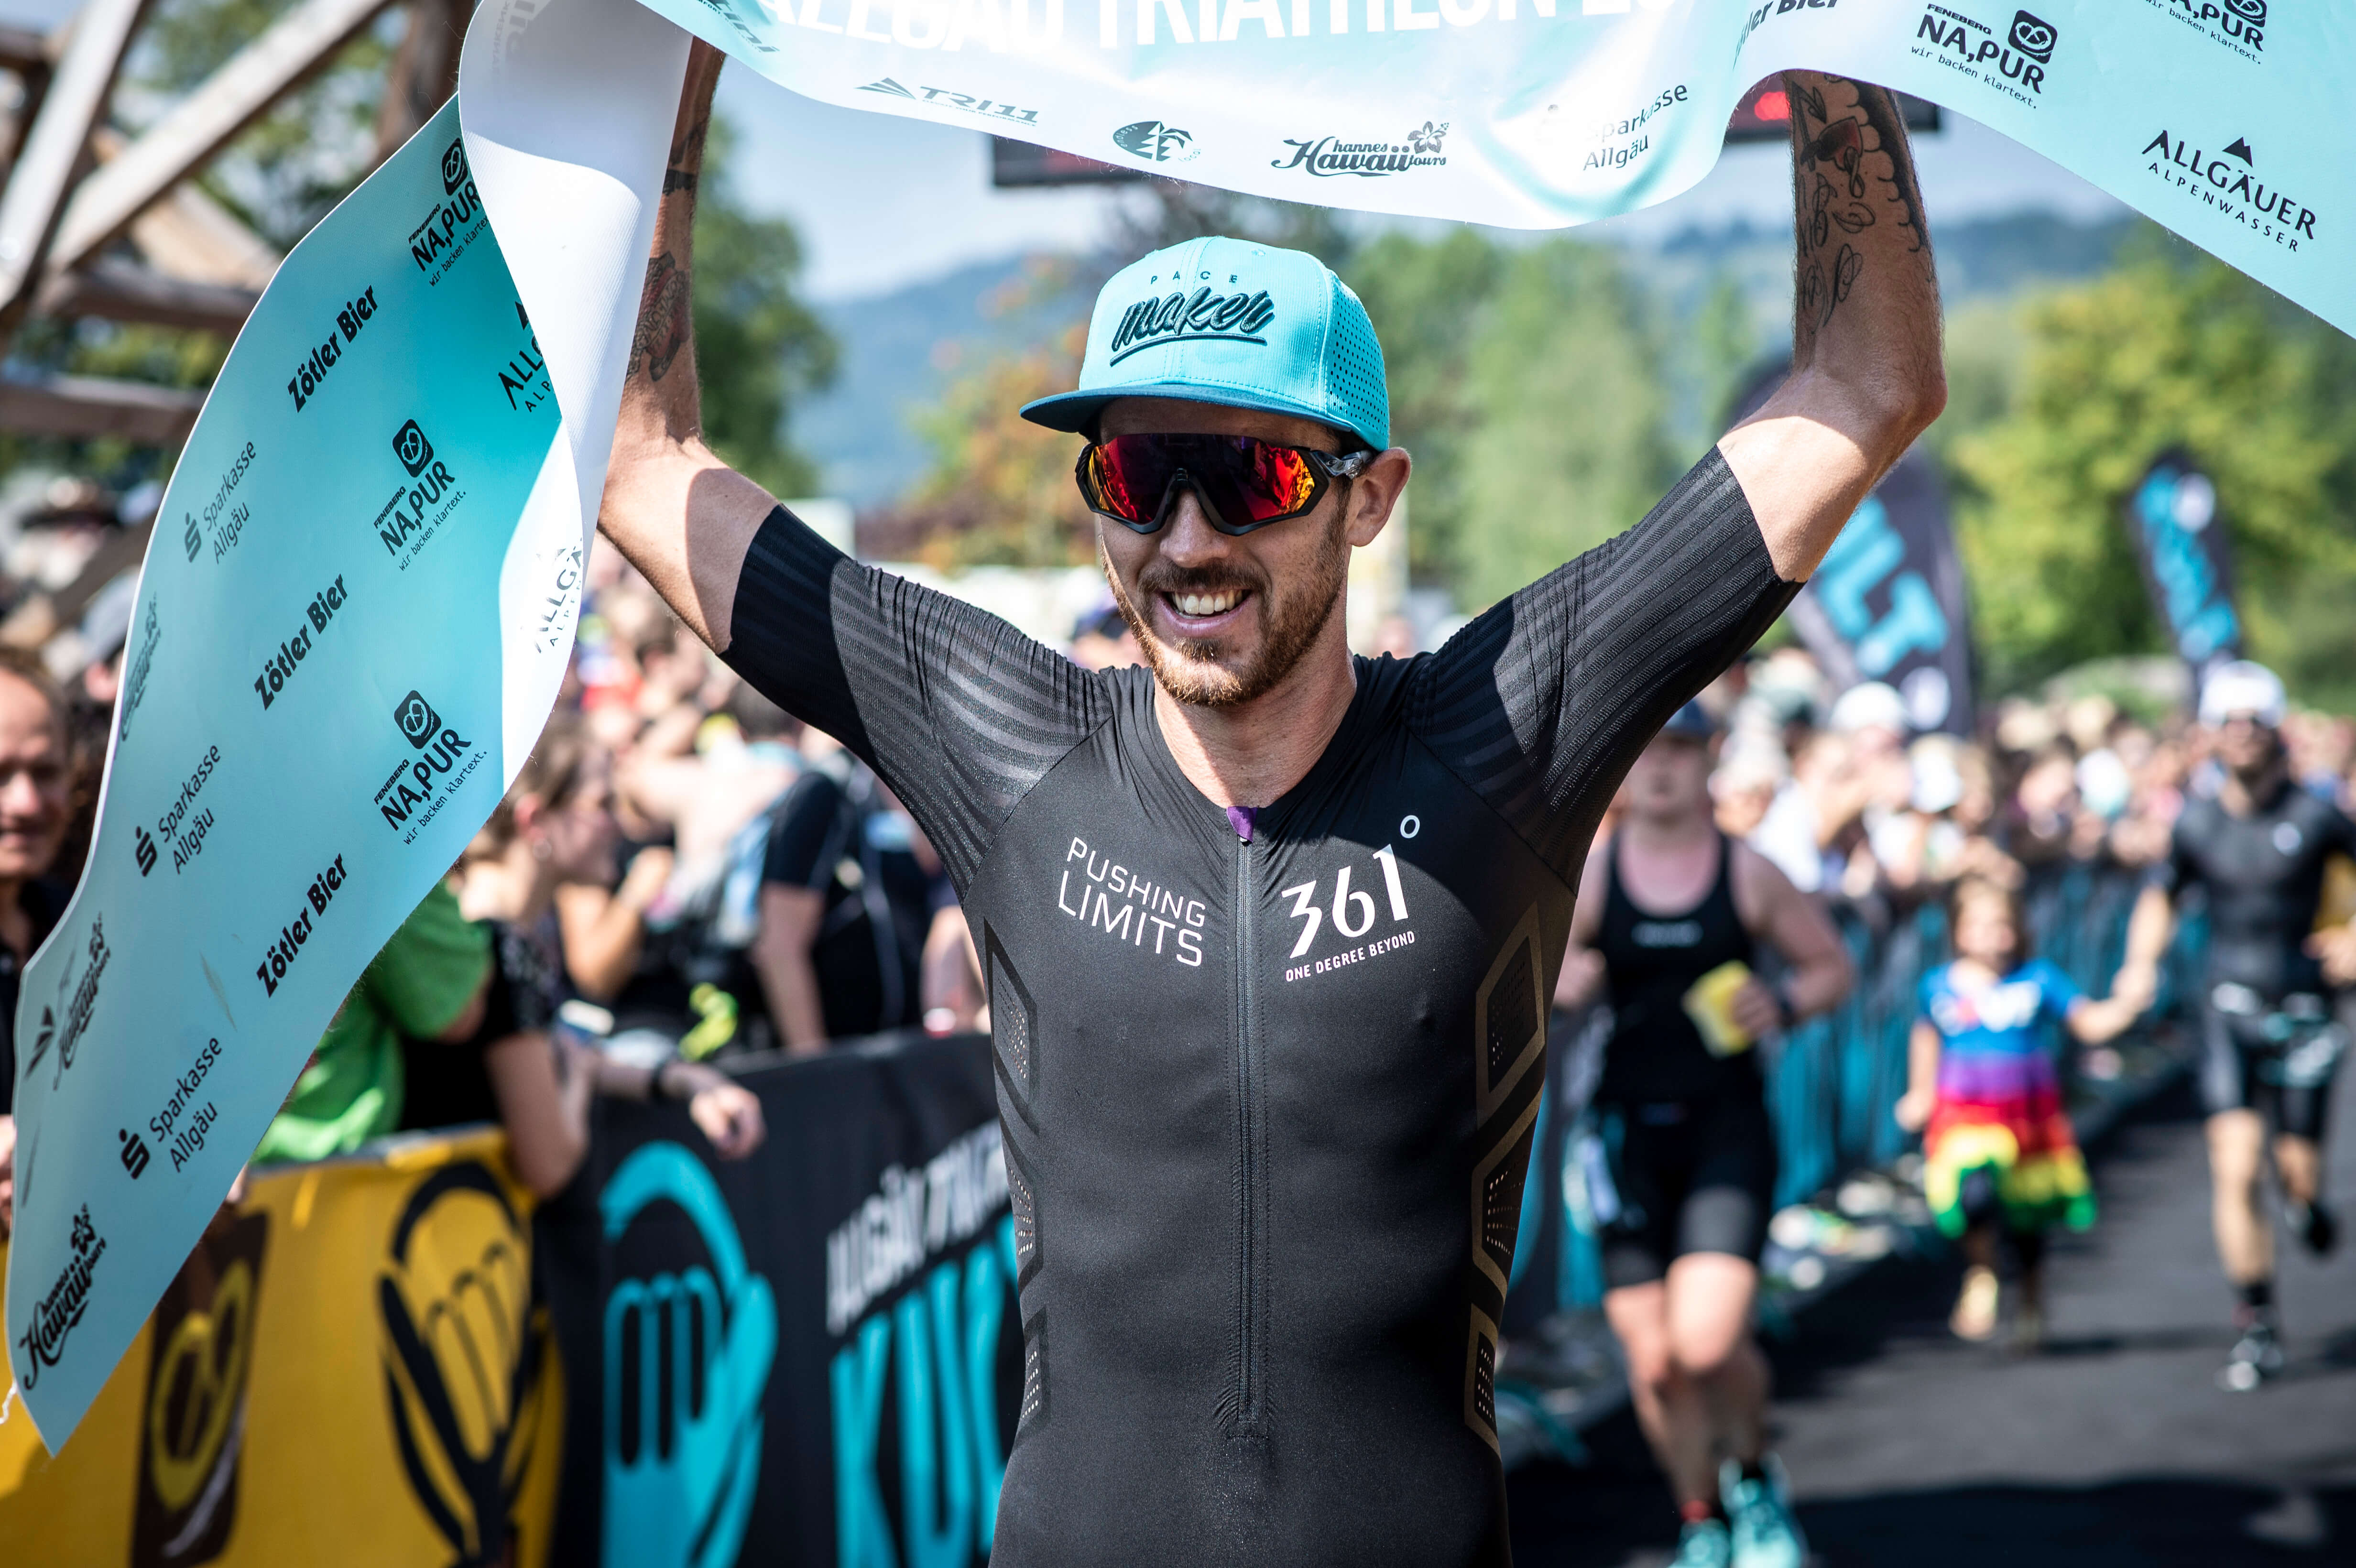 Niclas-Bock-Allgäu-Triathlon-Finish